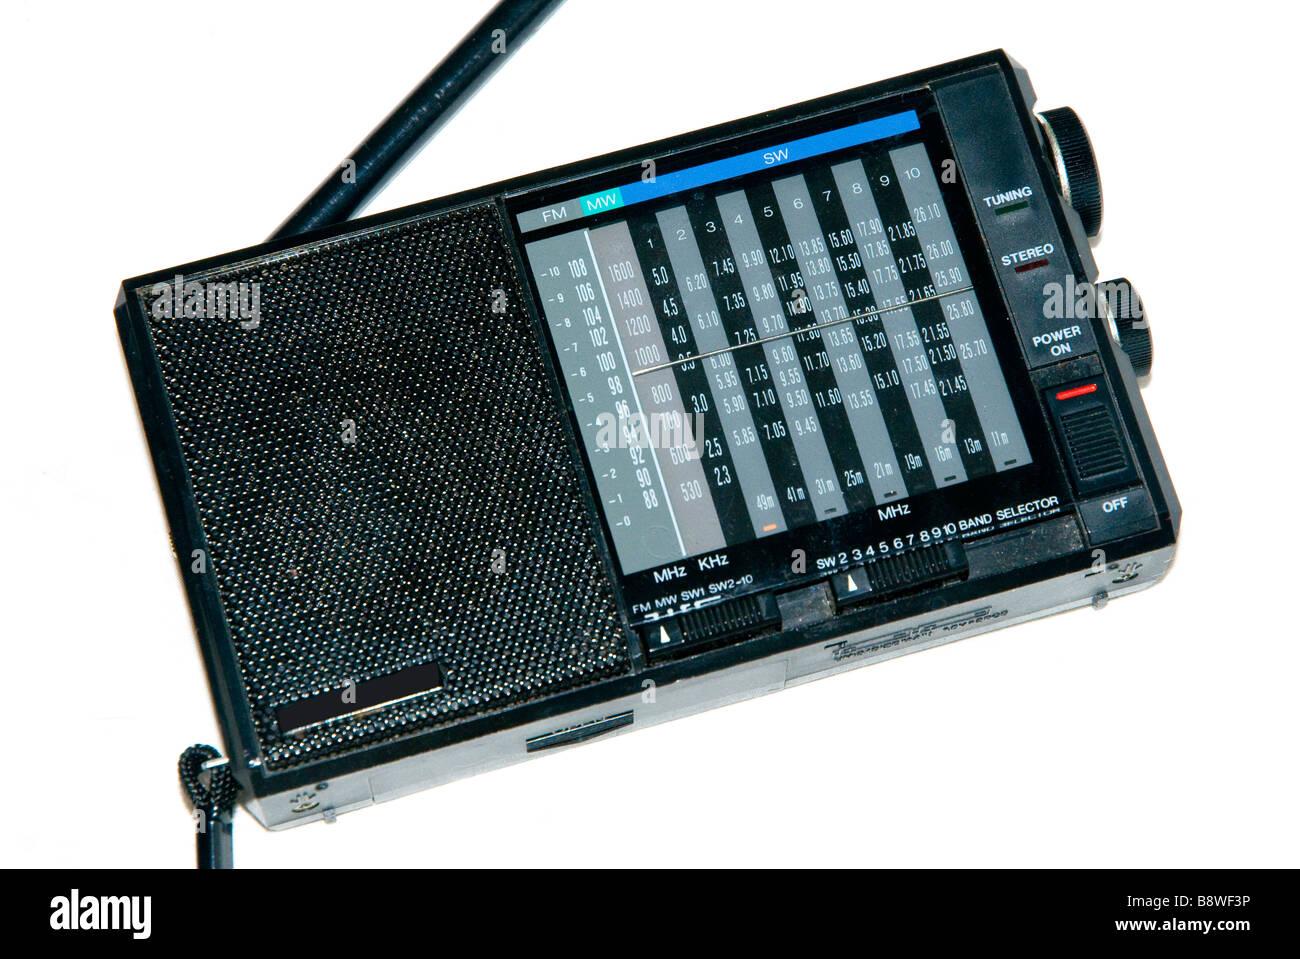 Short Wave Radio Stock Photos Images Alamy 25 Metres Range Am Transmitter Image